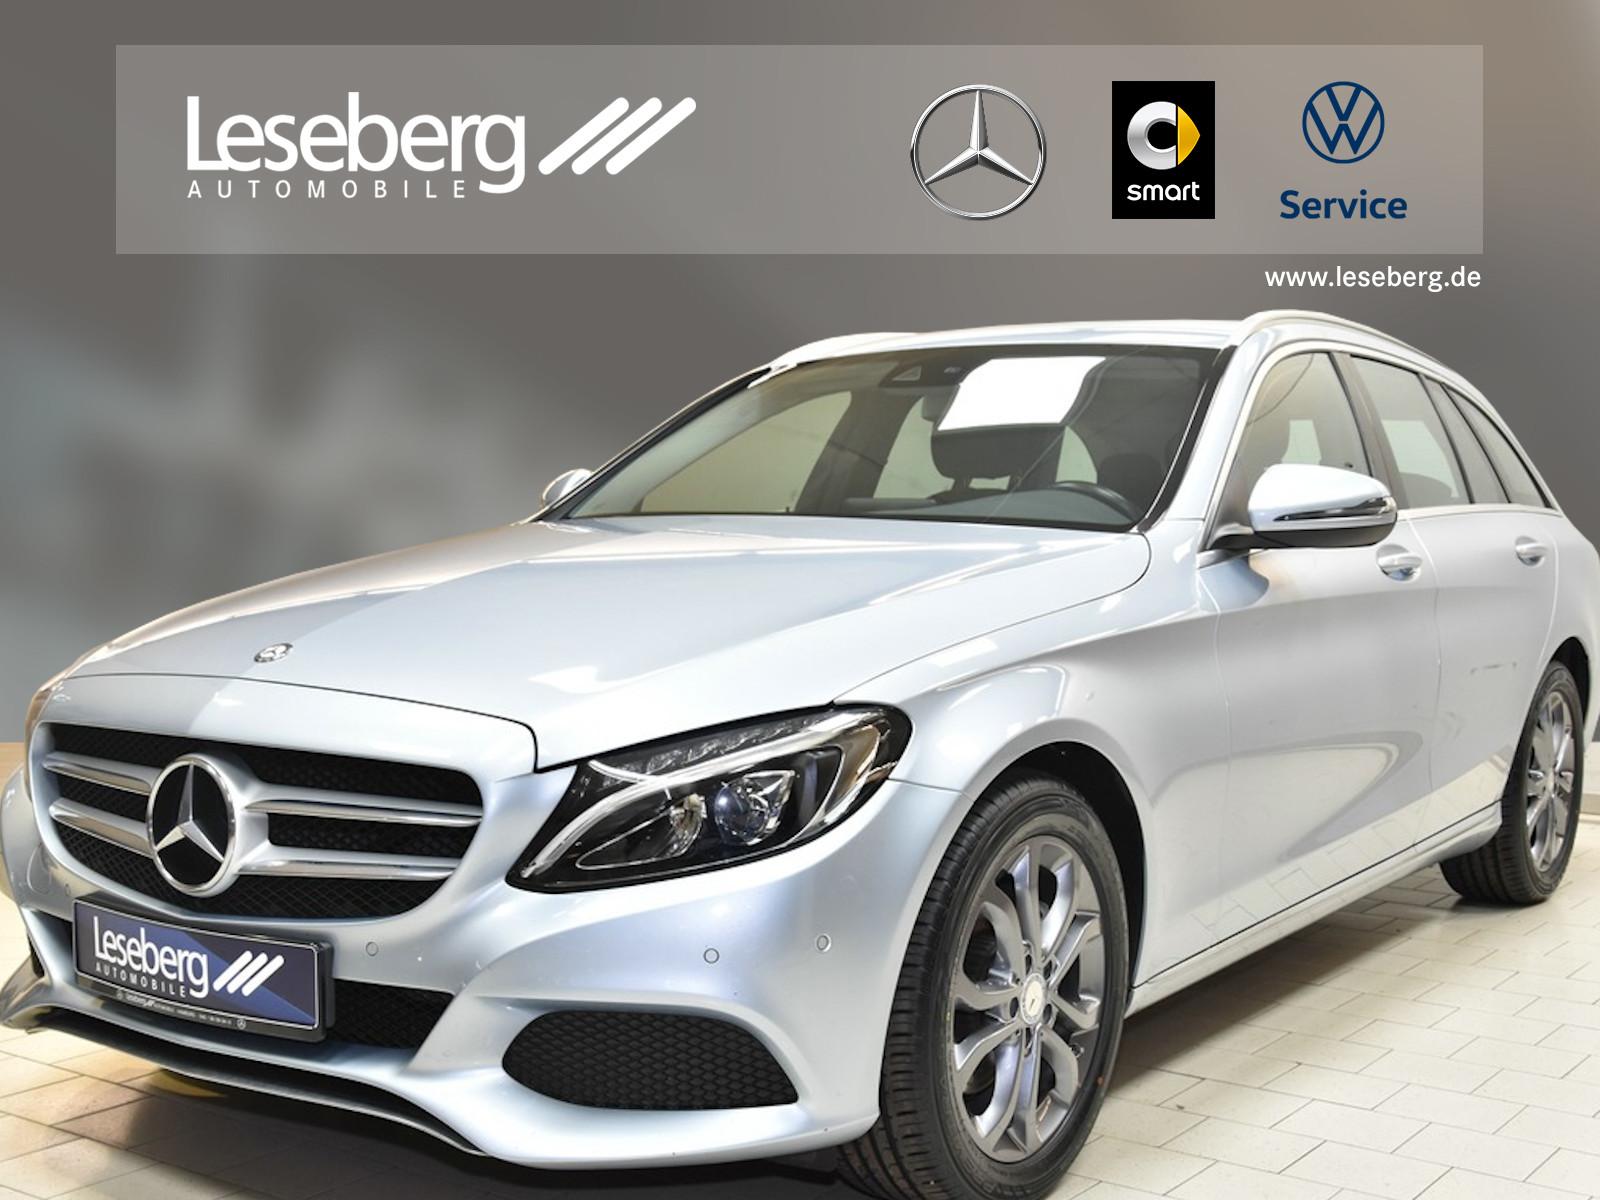 Mercedes-Benz C 220 d T Avantgarde/LED/Navigation/PTS/Sitzhzg., Jahr 2016, Diesel